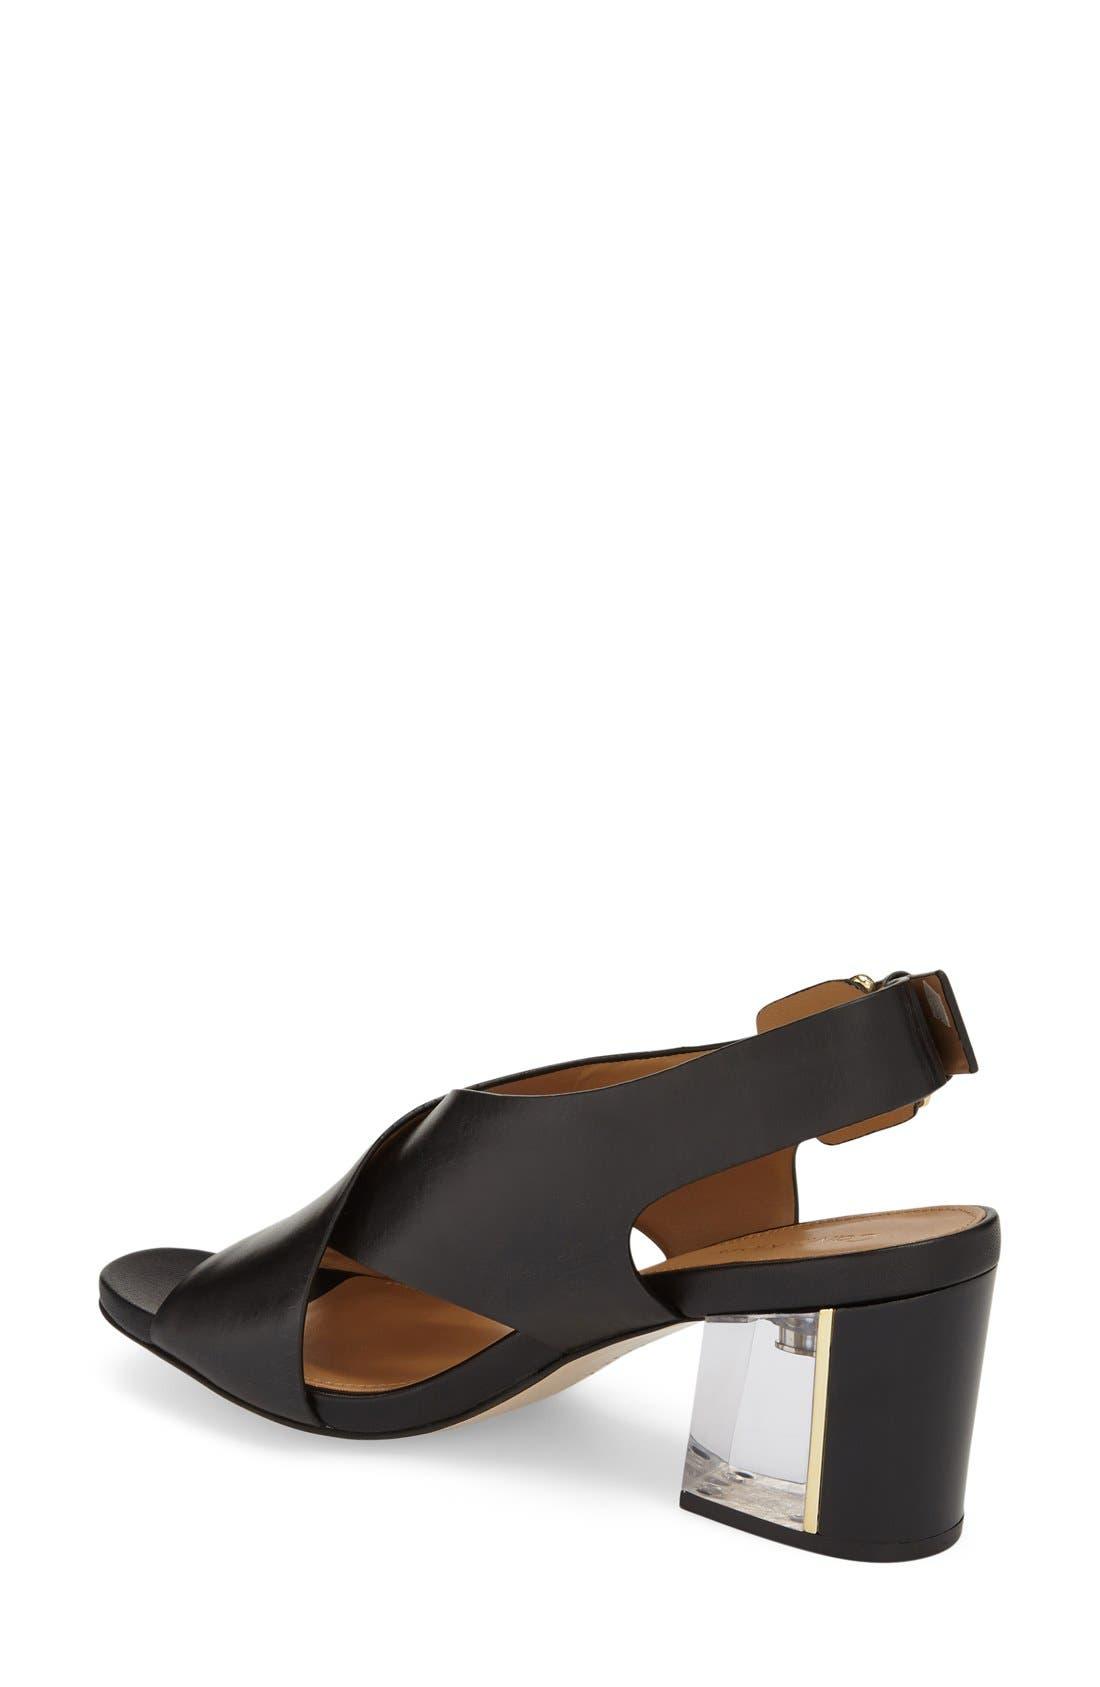 Alternate Image 2  - Calvin Klein 'Loni' Clear Block Heel Sandal (Women)